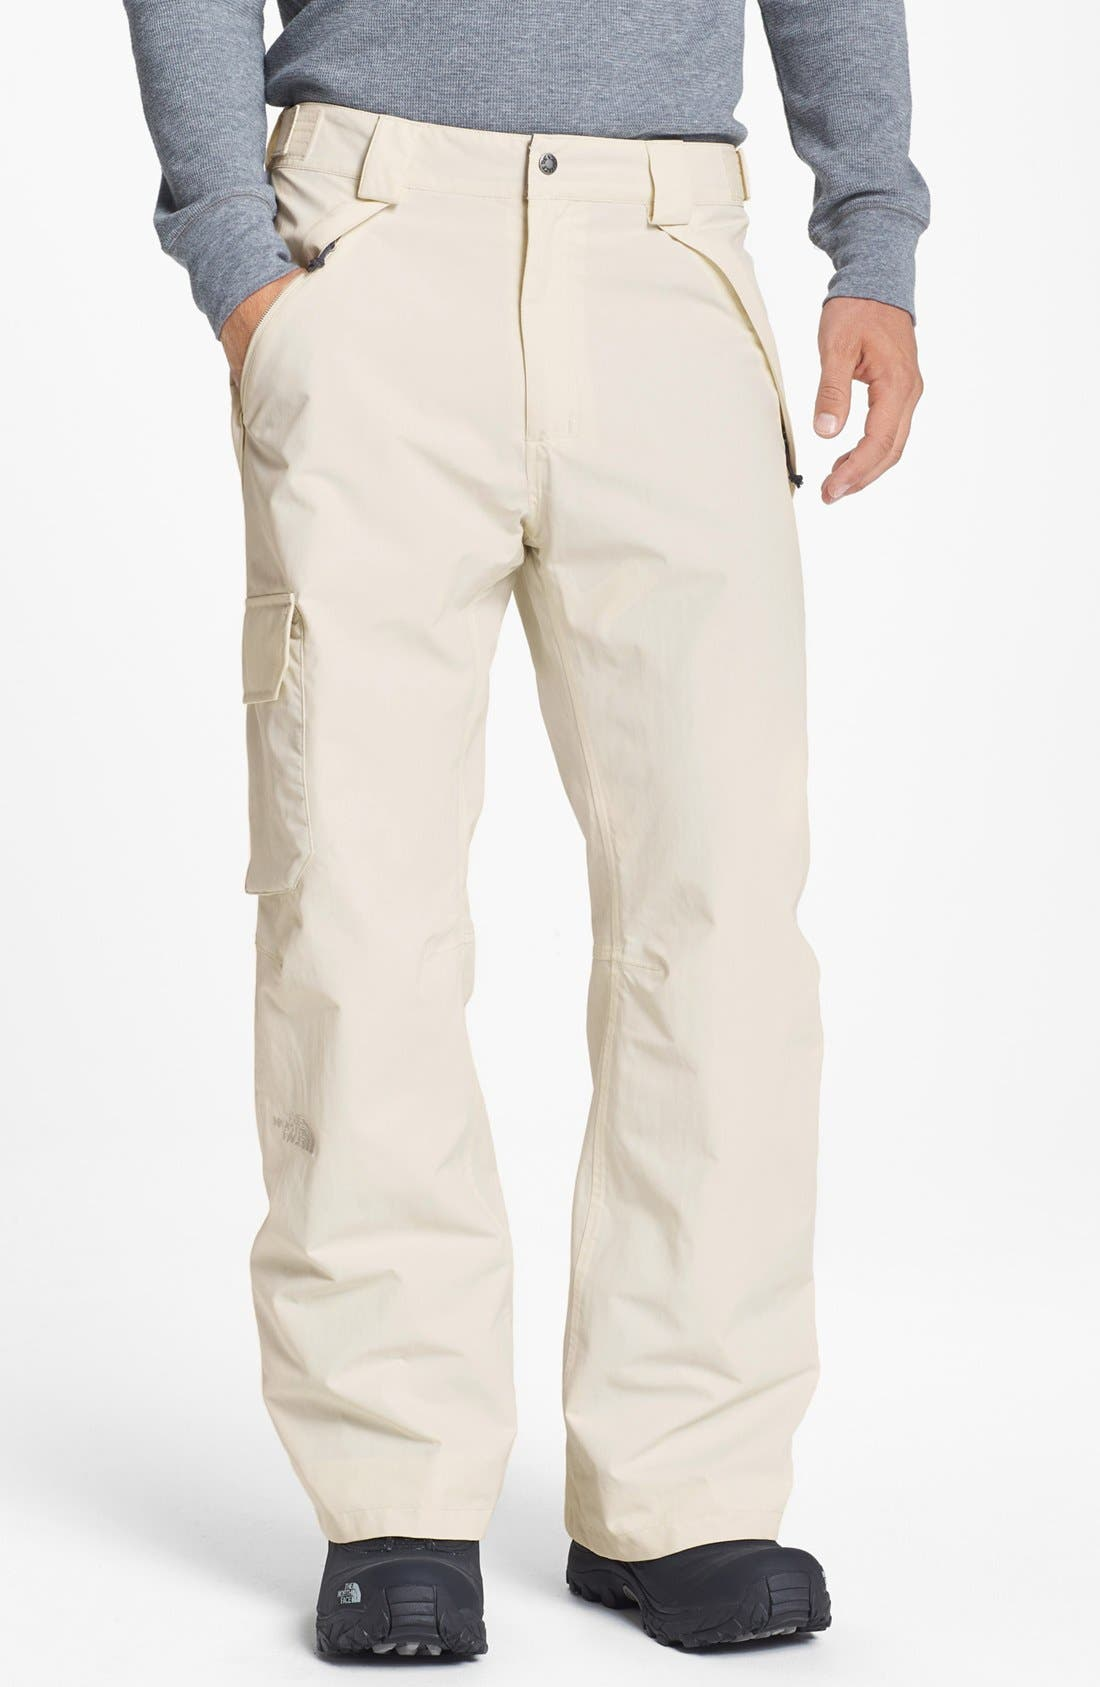 Alternate Image 1 Selected - The North Face 'Seymore' Ski Pants